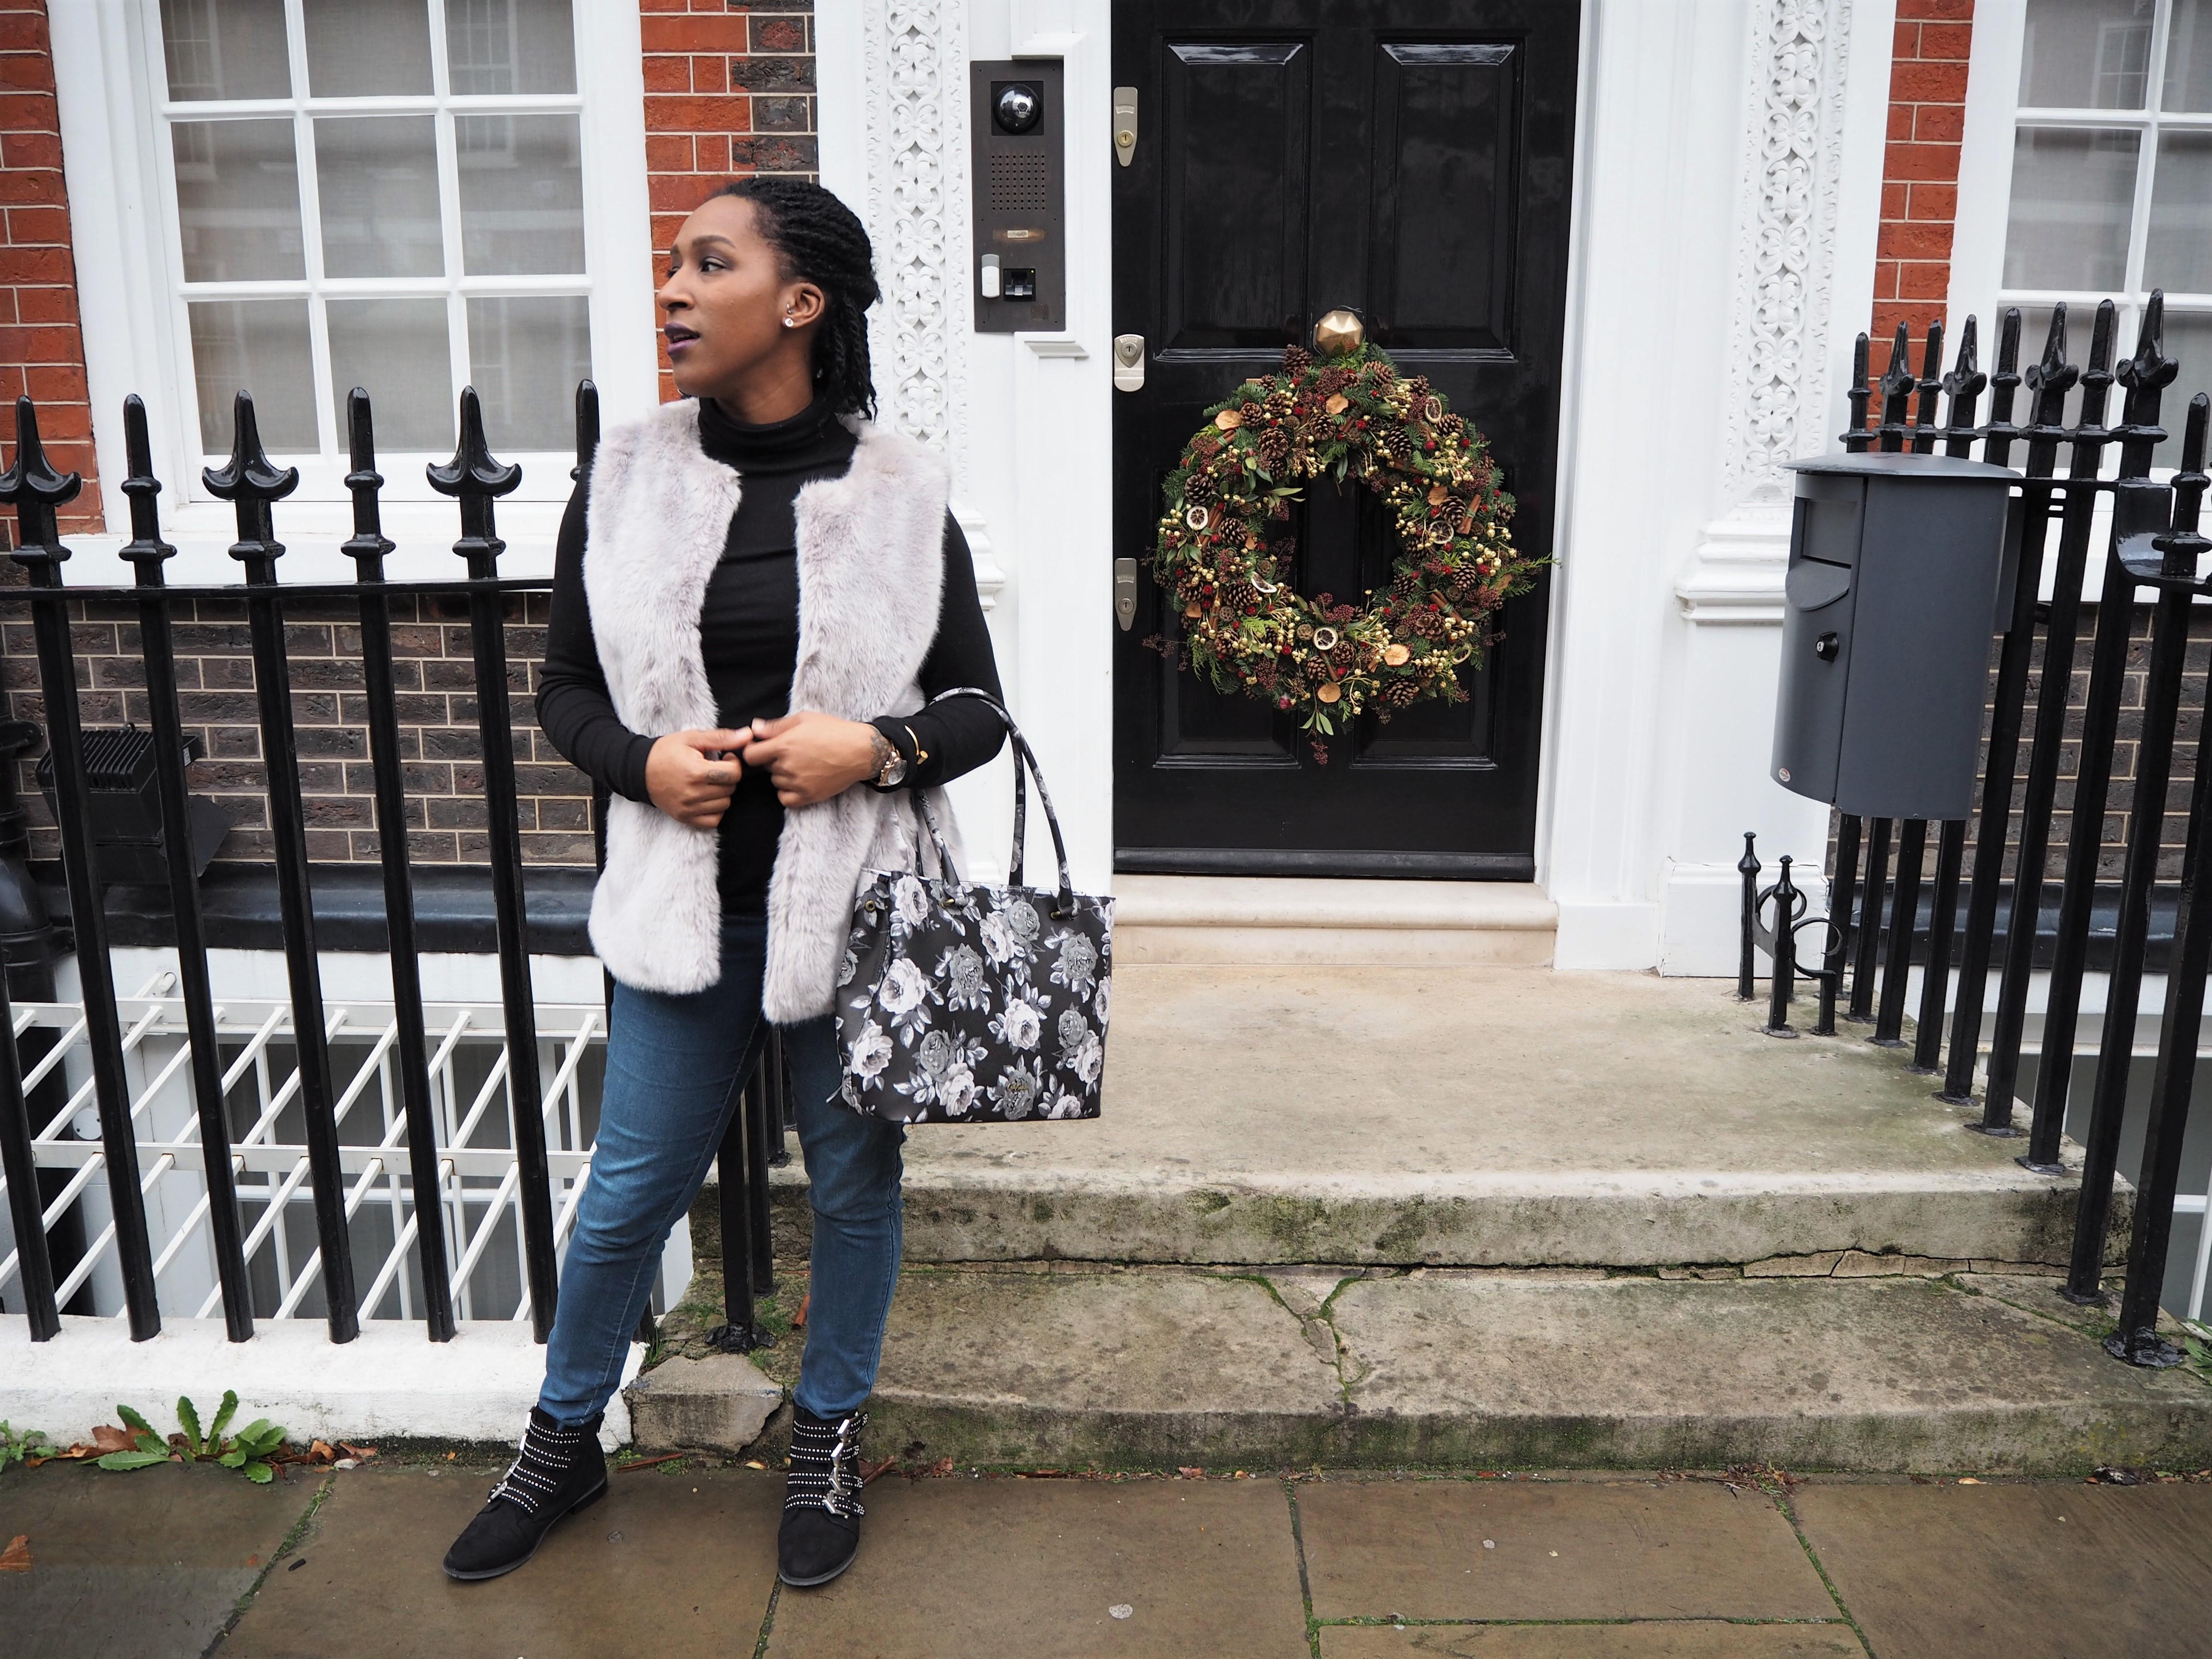 A Fresh New Start | 2018 Resolutions